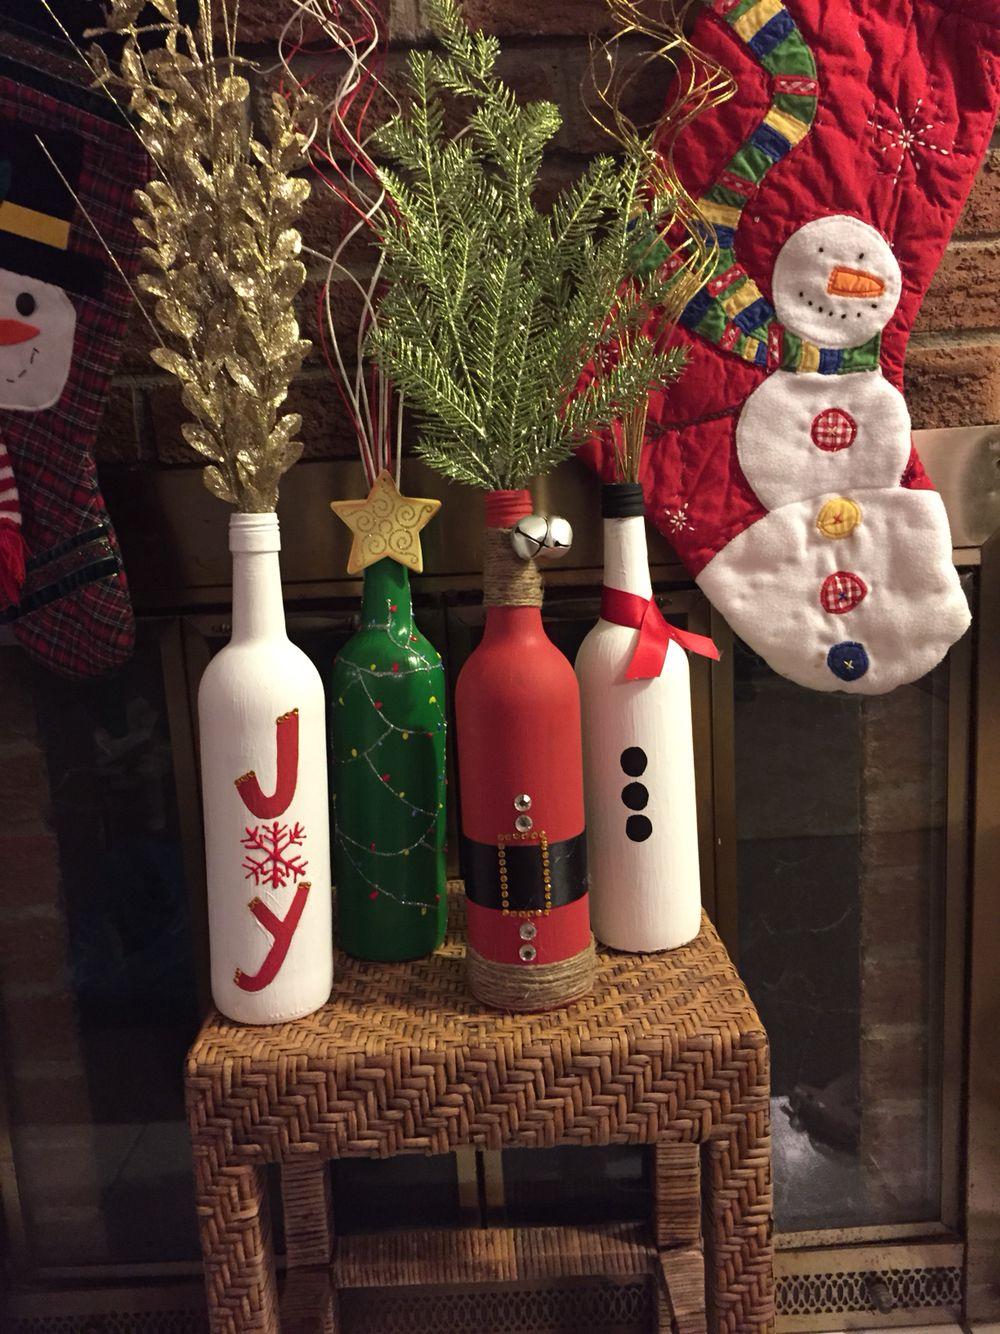 Diy Christmas Wine Bottles Christmas Decor Holiday Decorations Holiday Wine Bottles Diy Diy Bottle Crafts Holiday Wine Bottles